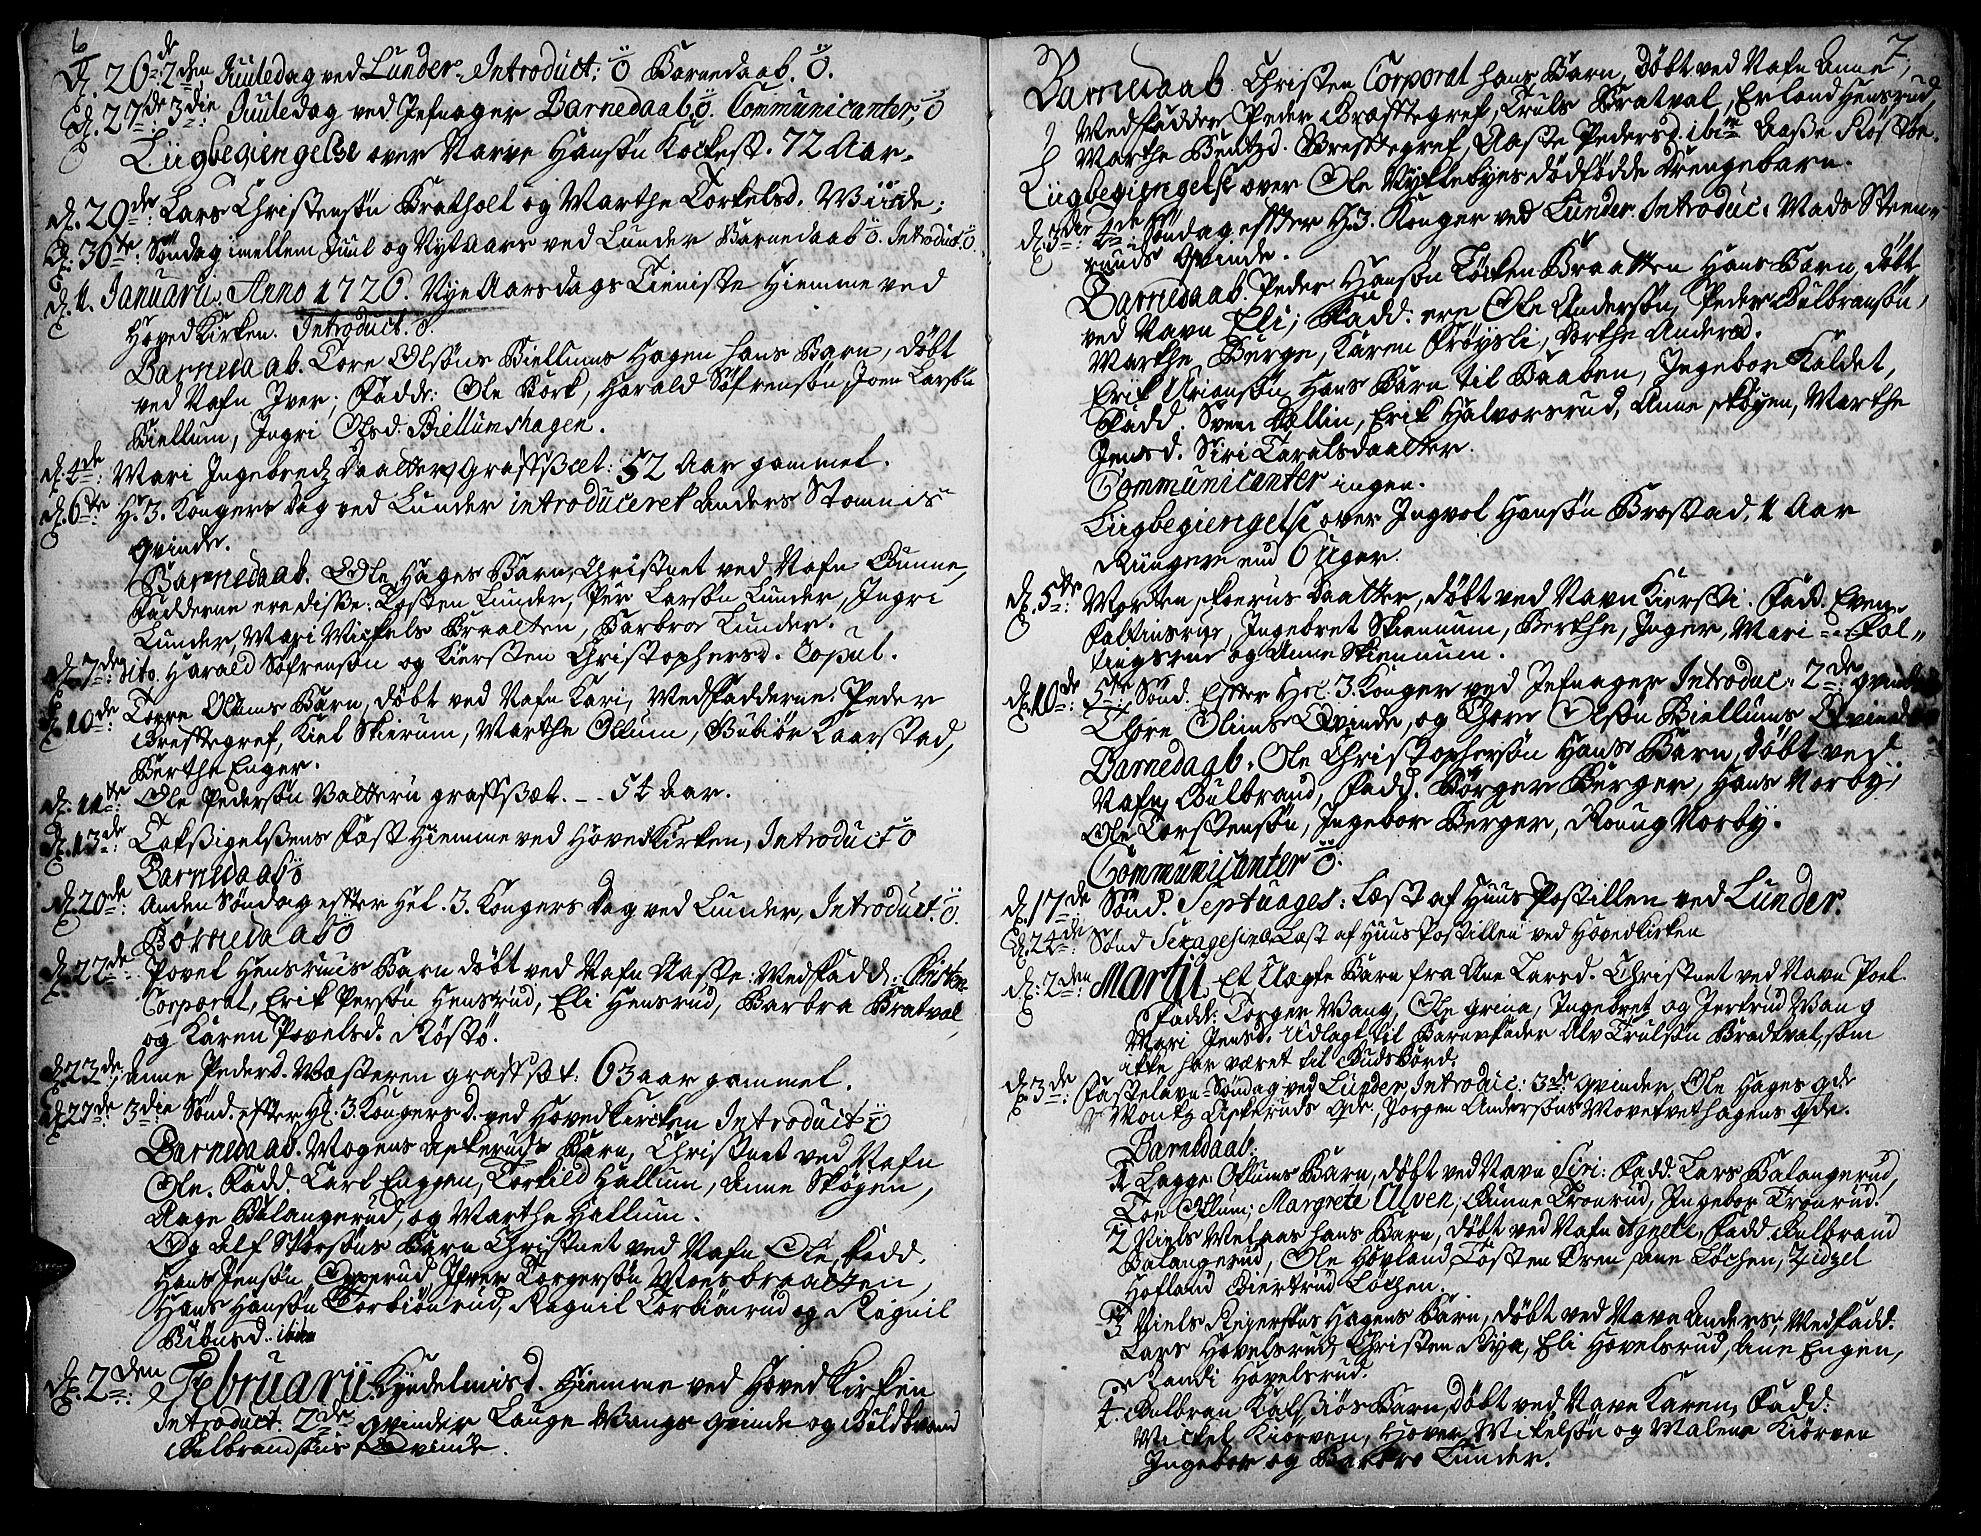 SAH, Jevnaker prestekontor, Ministerialbok nr. 2, 1725-1751, s. 6-7